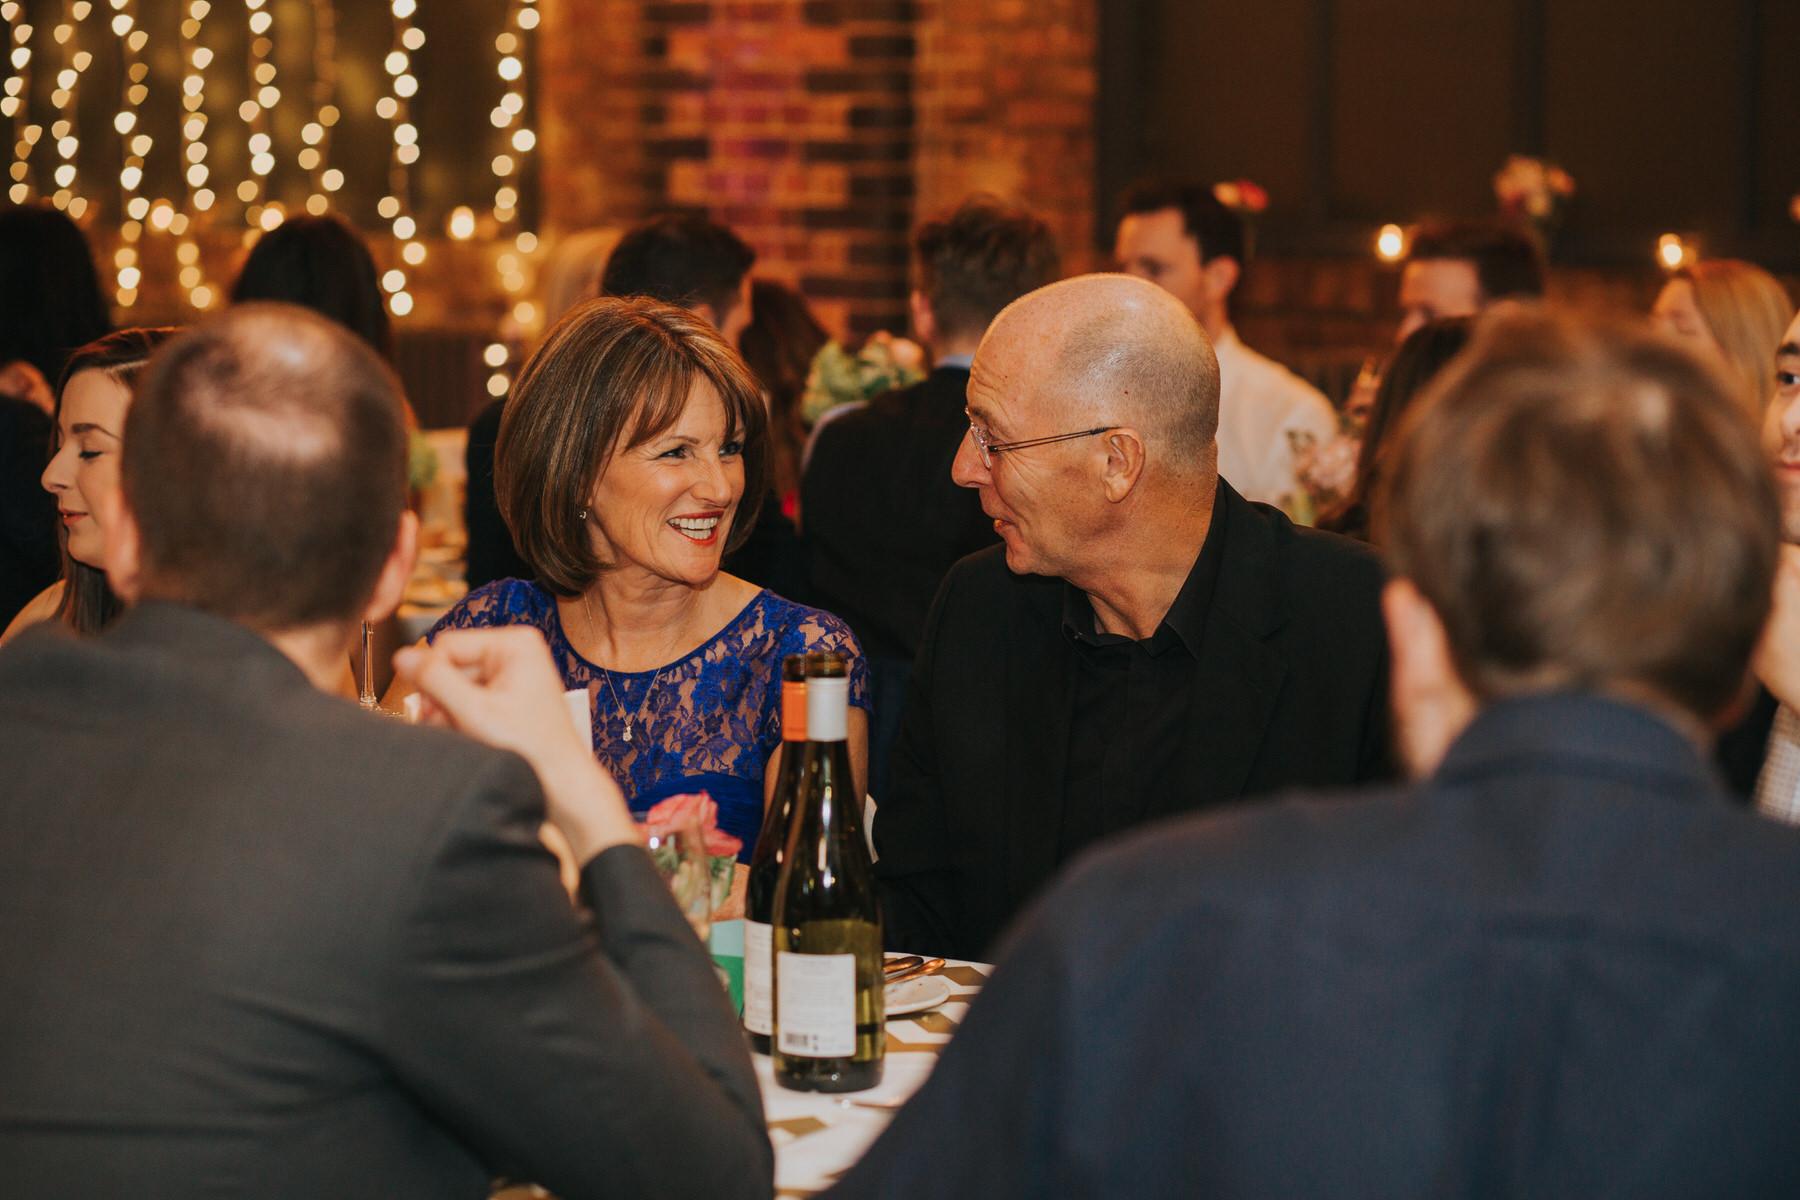 166-St Chads Place brides mum dad dinner event reportage .jpg